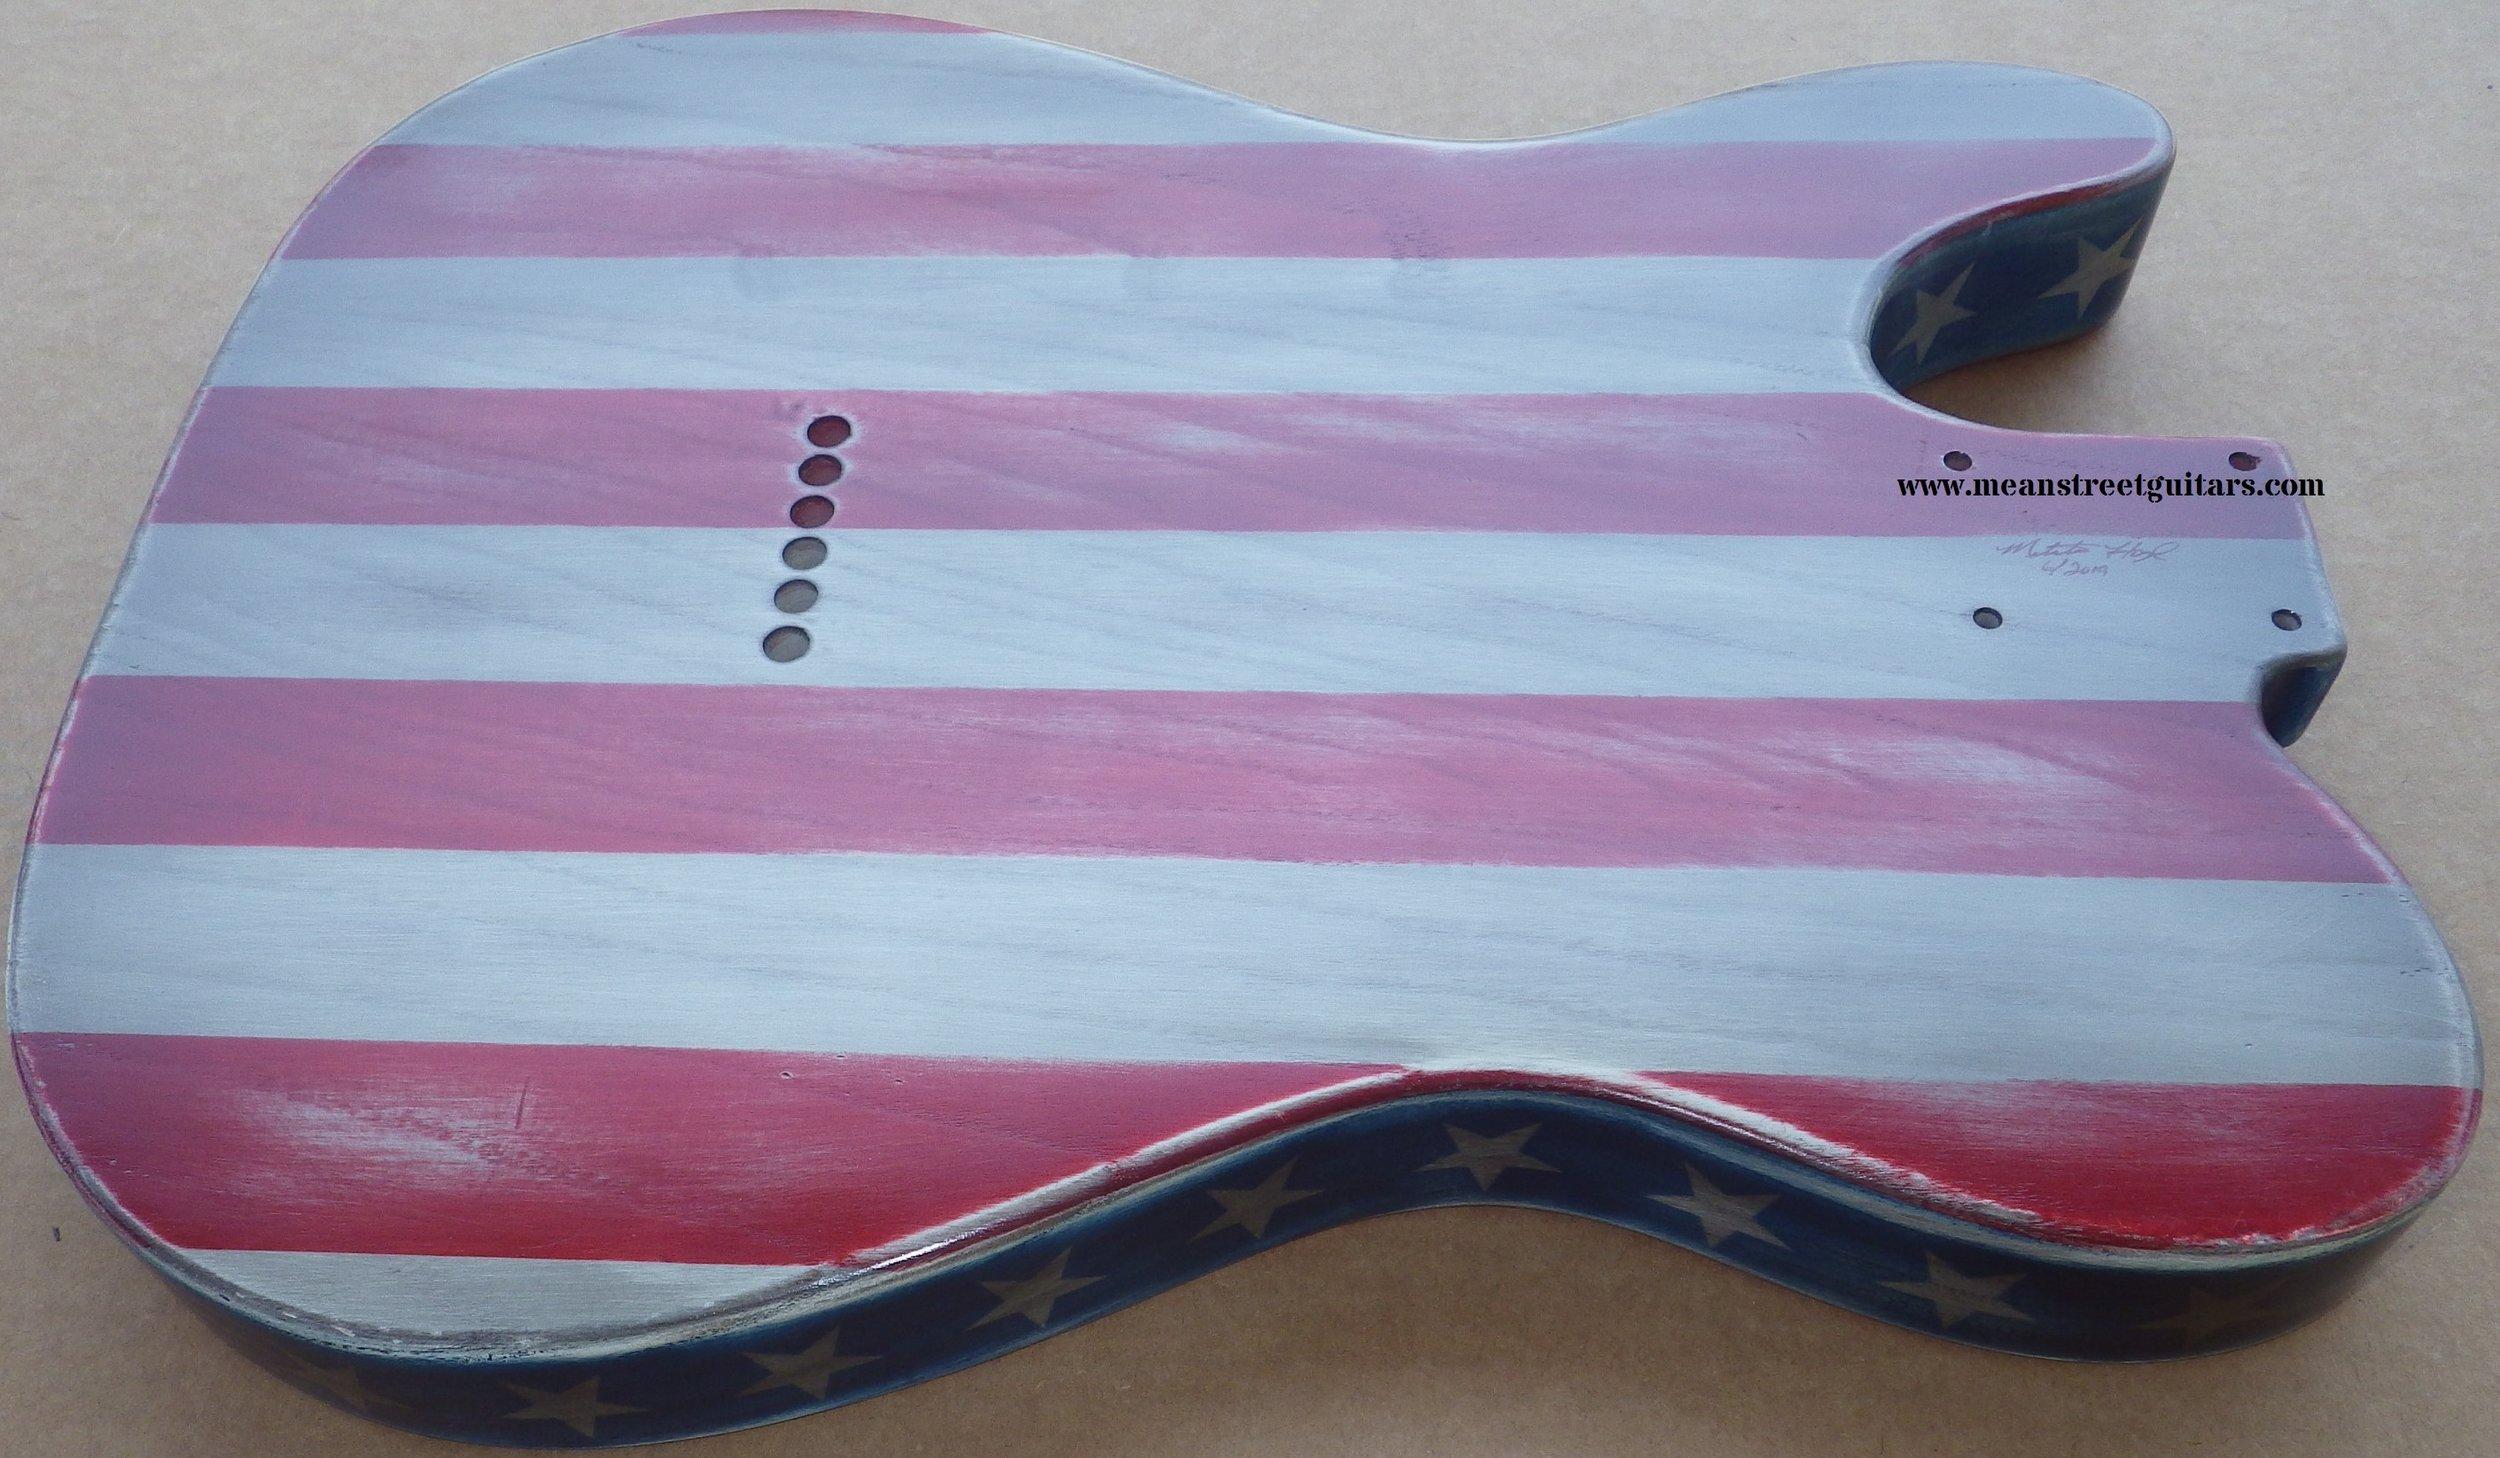 Mean Street American Flag Tele relic paint job Shawne P pic 8.jpg